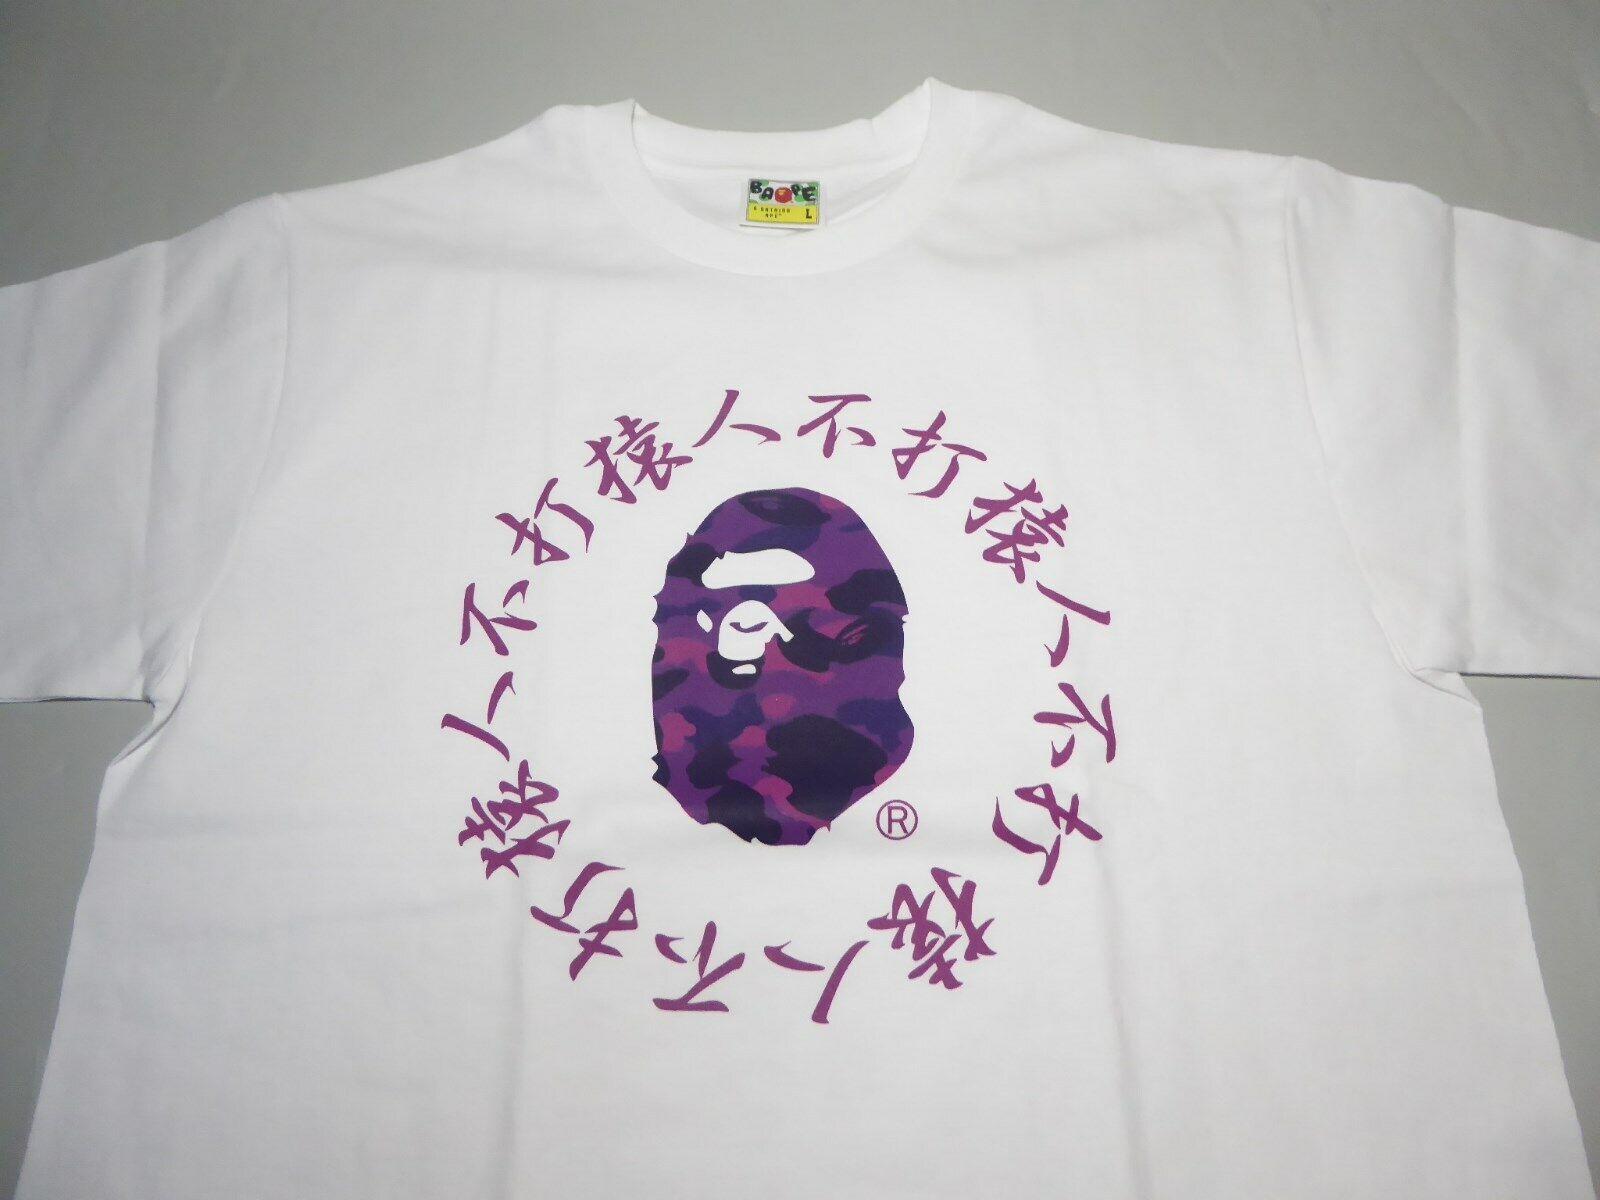 19925 bape color camo kanji logo white purple tee tee XXL